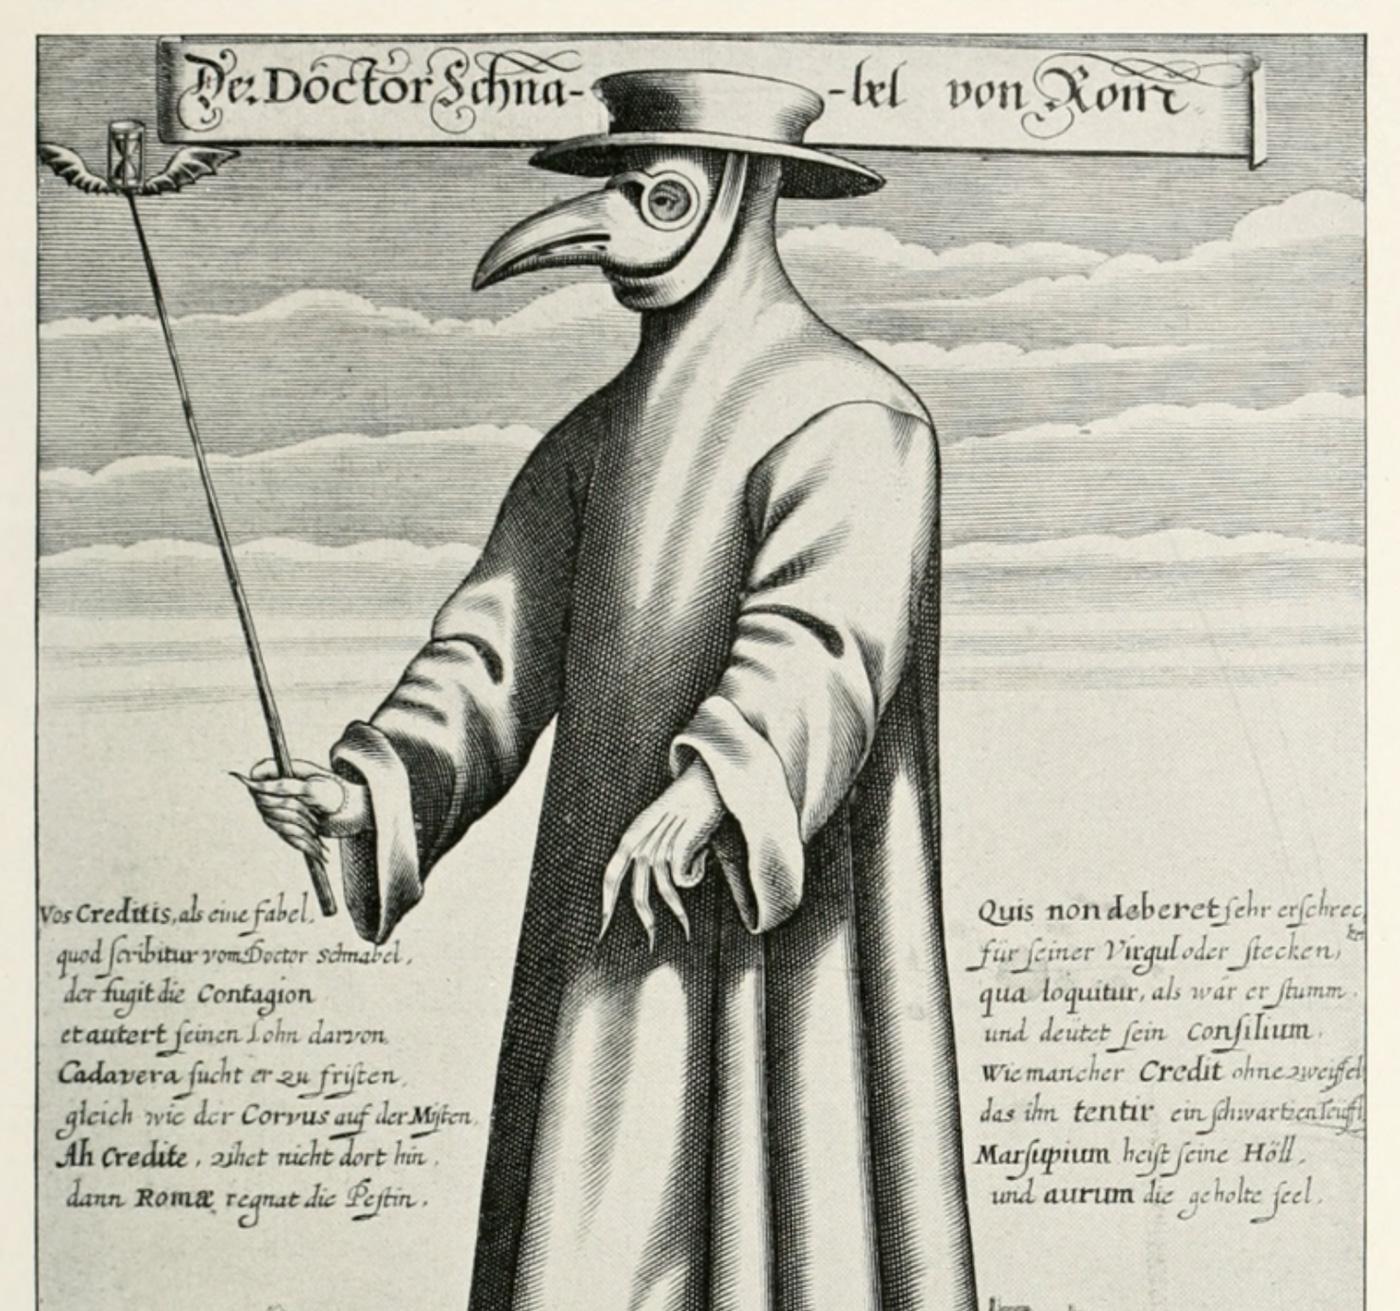 The Beak mask